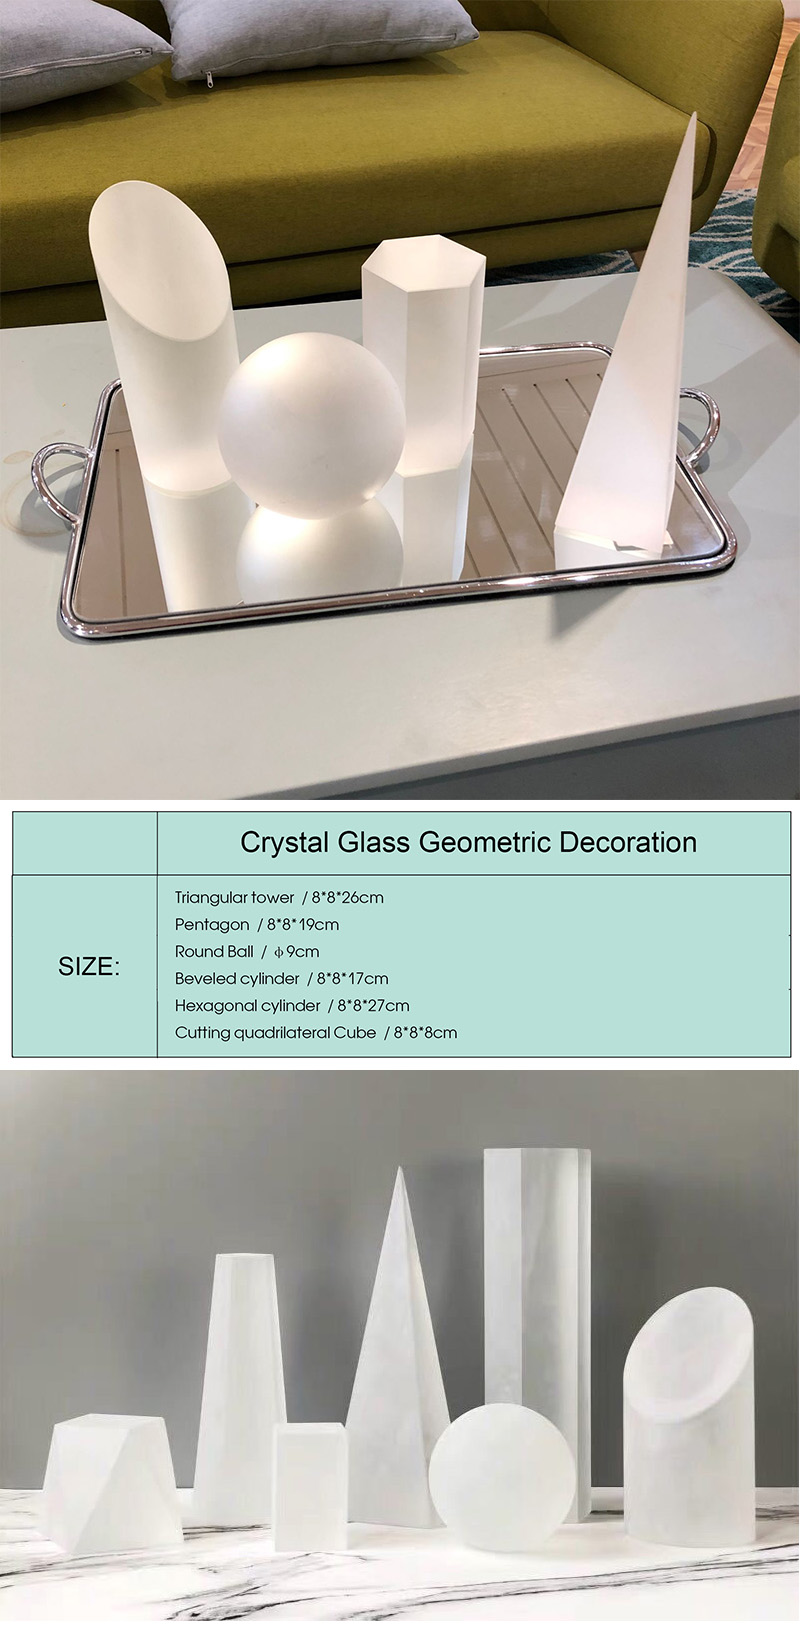 Beautiful Decorative crystal crafts obsidian crystal Ball pyramid Beveled cylinder Pillar Geometric ornaments for Weeding gift